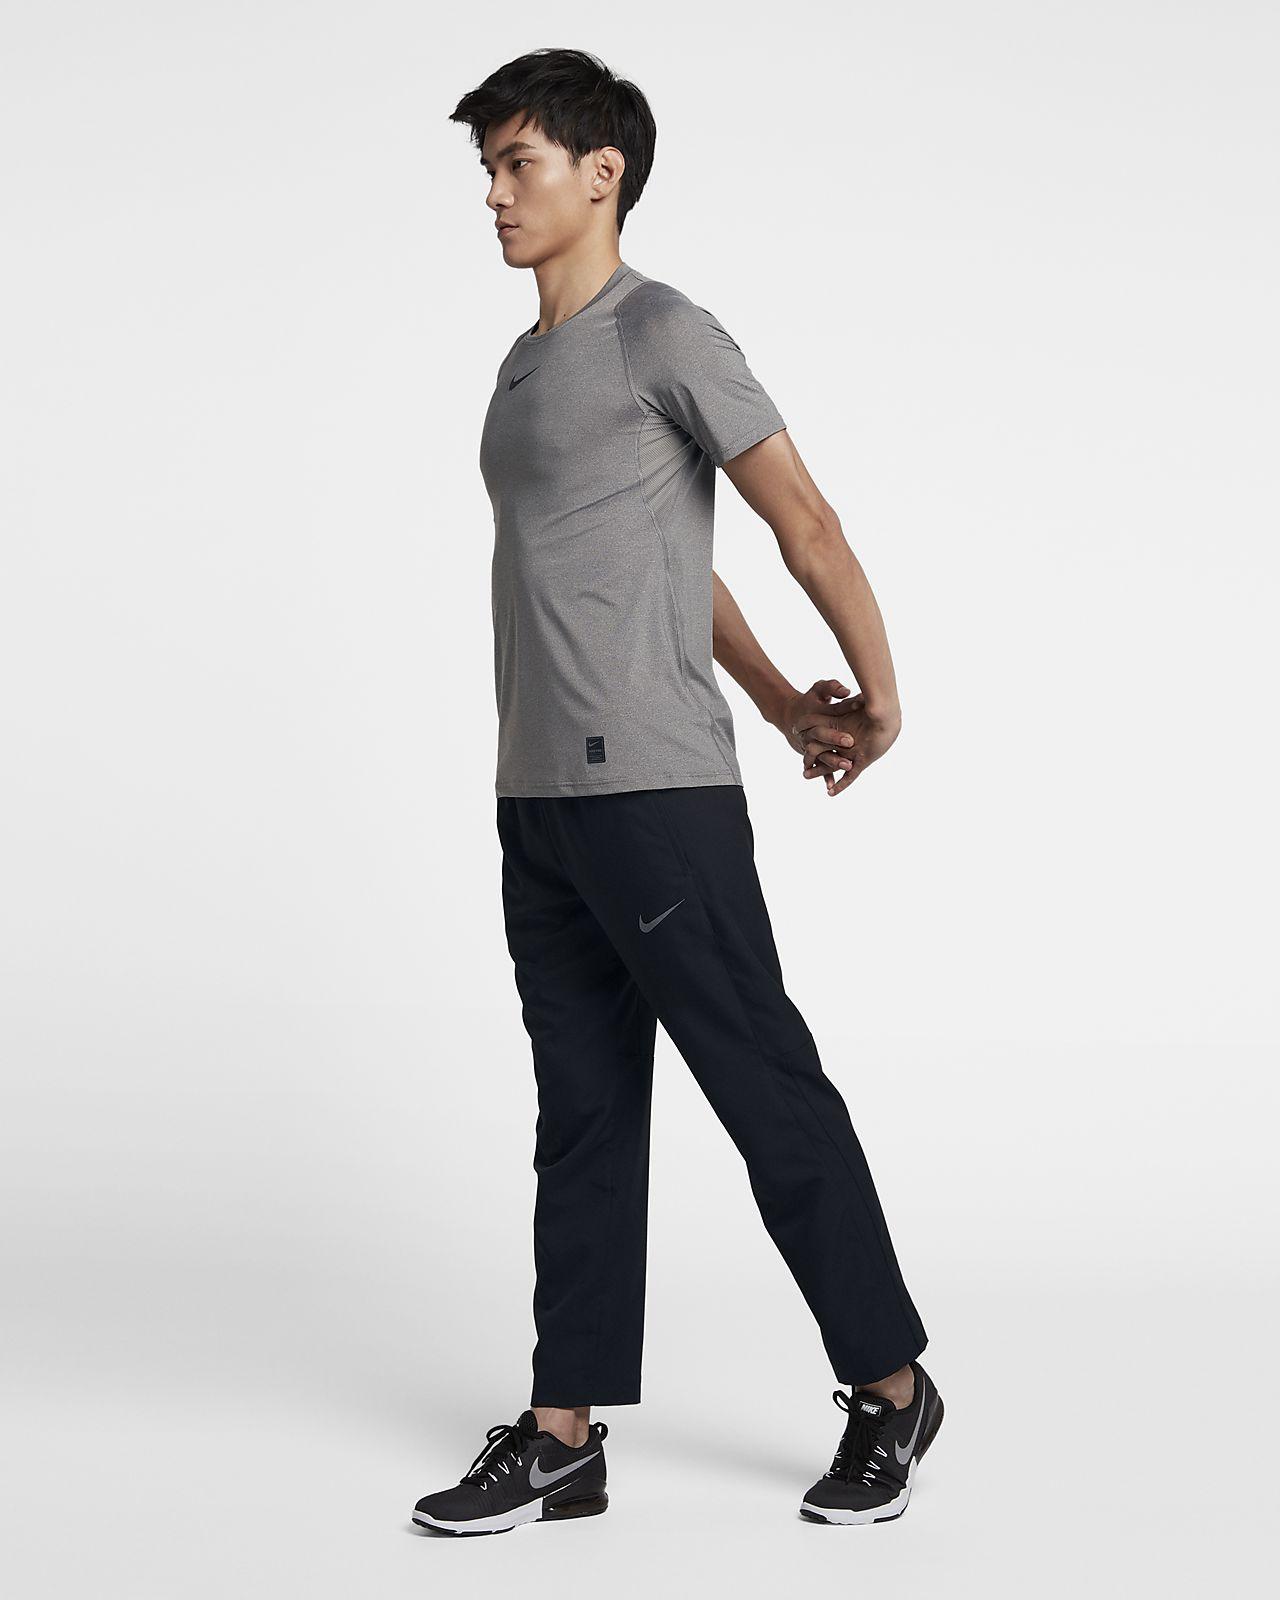 Pantaloni da training woven Nike Dri FIT Uomo. Nike IT